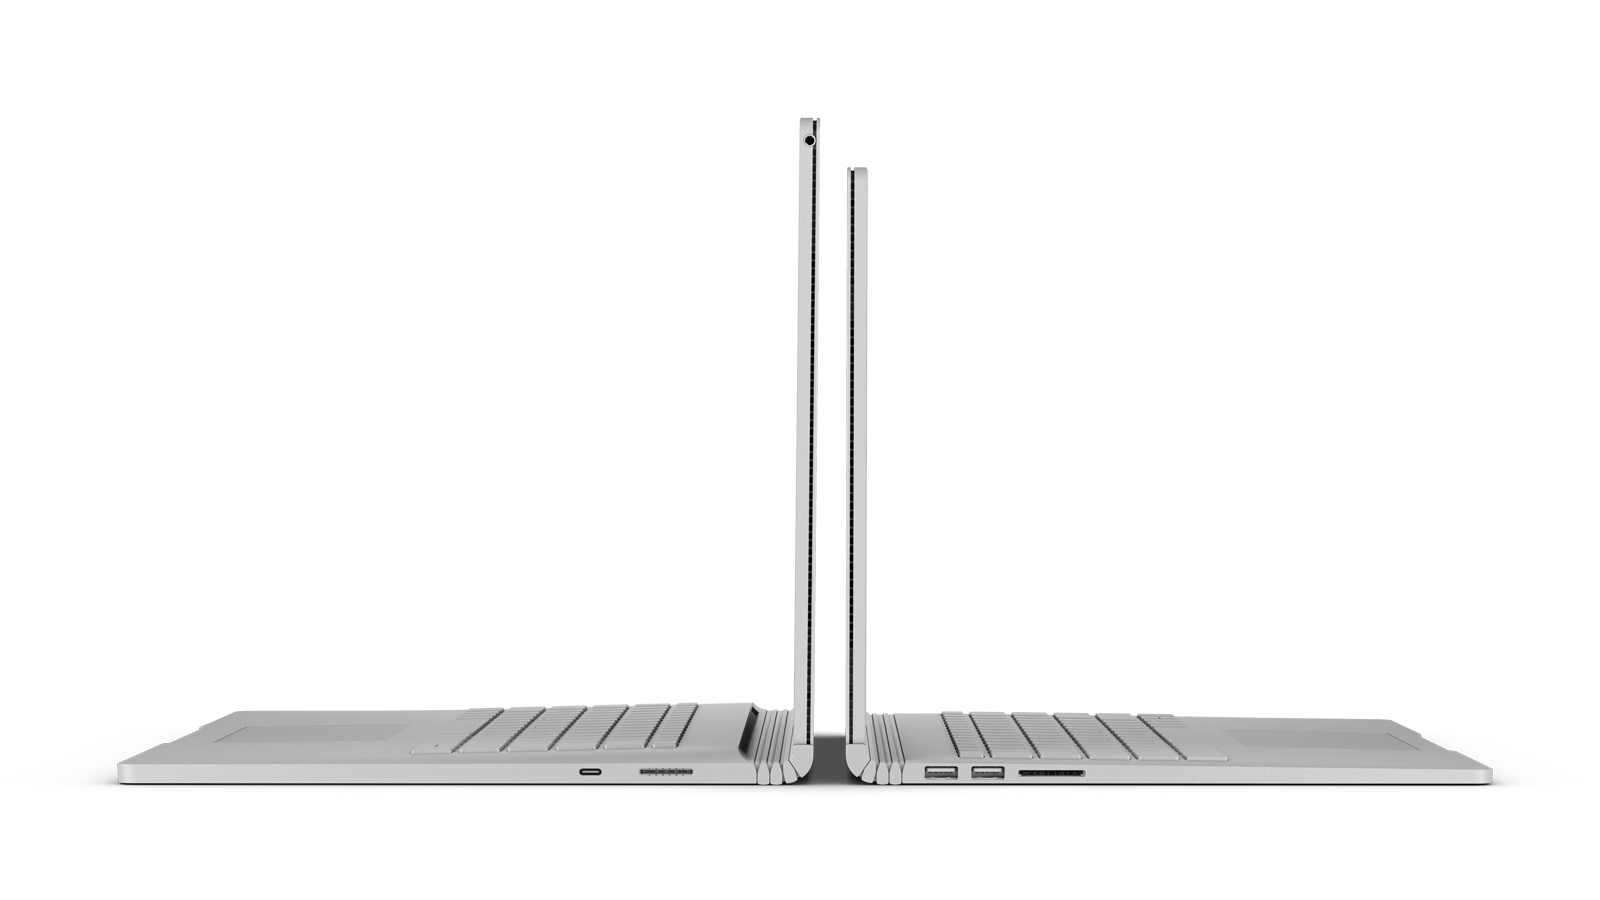 15 吋和 13.5 吋 Surface Book 2 並排。